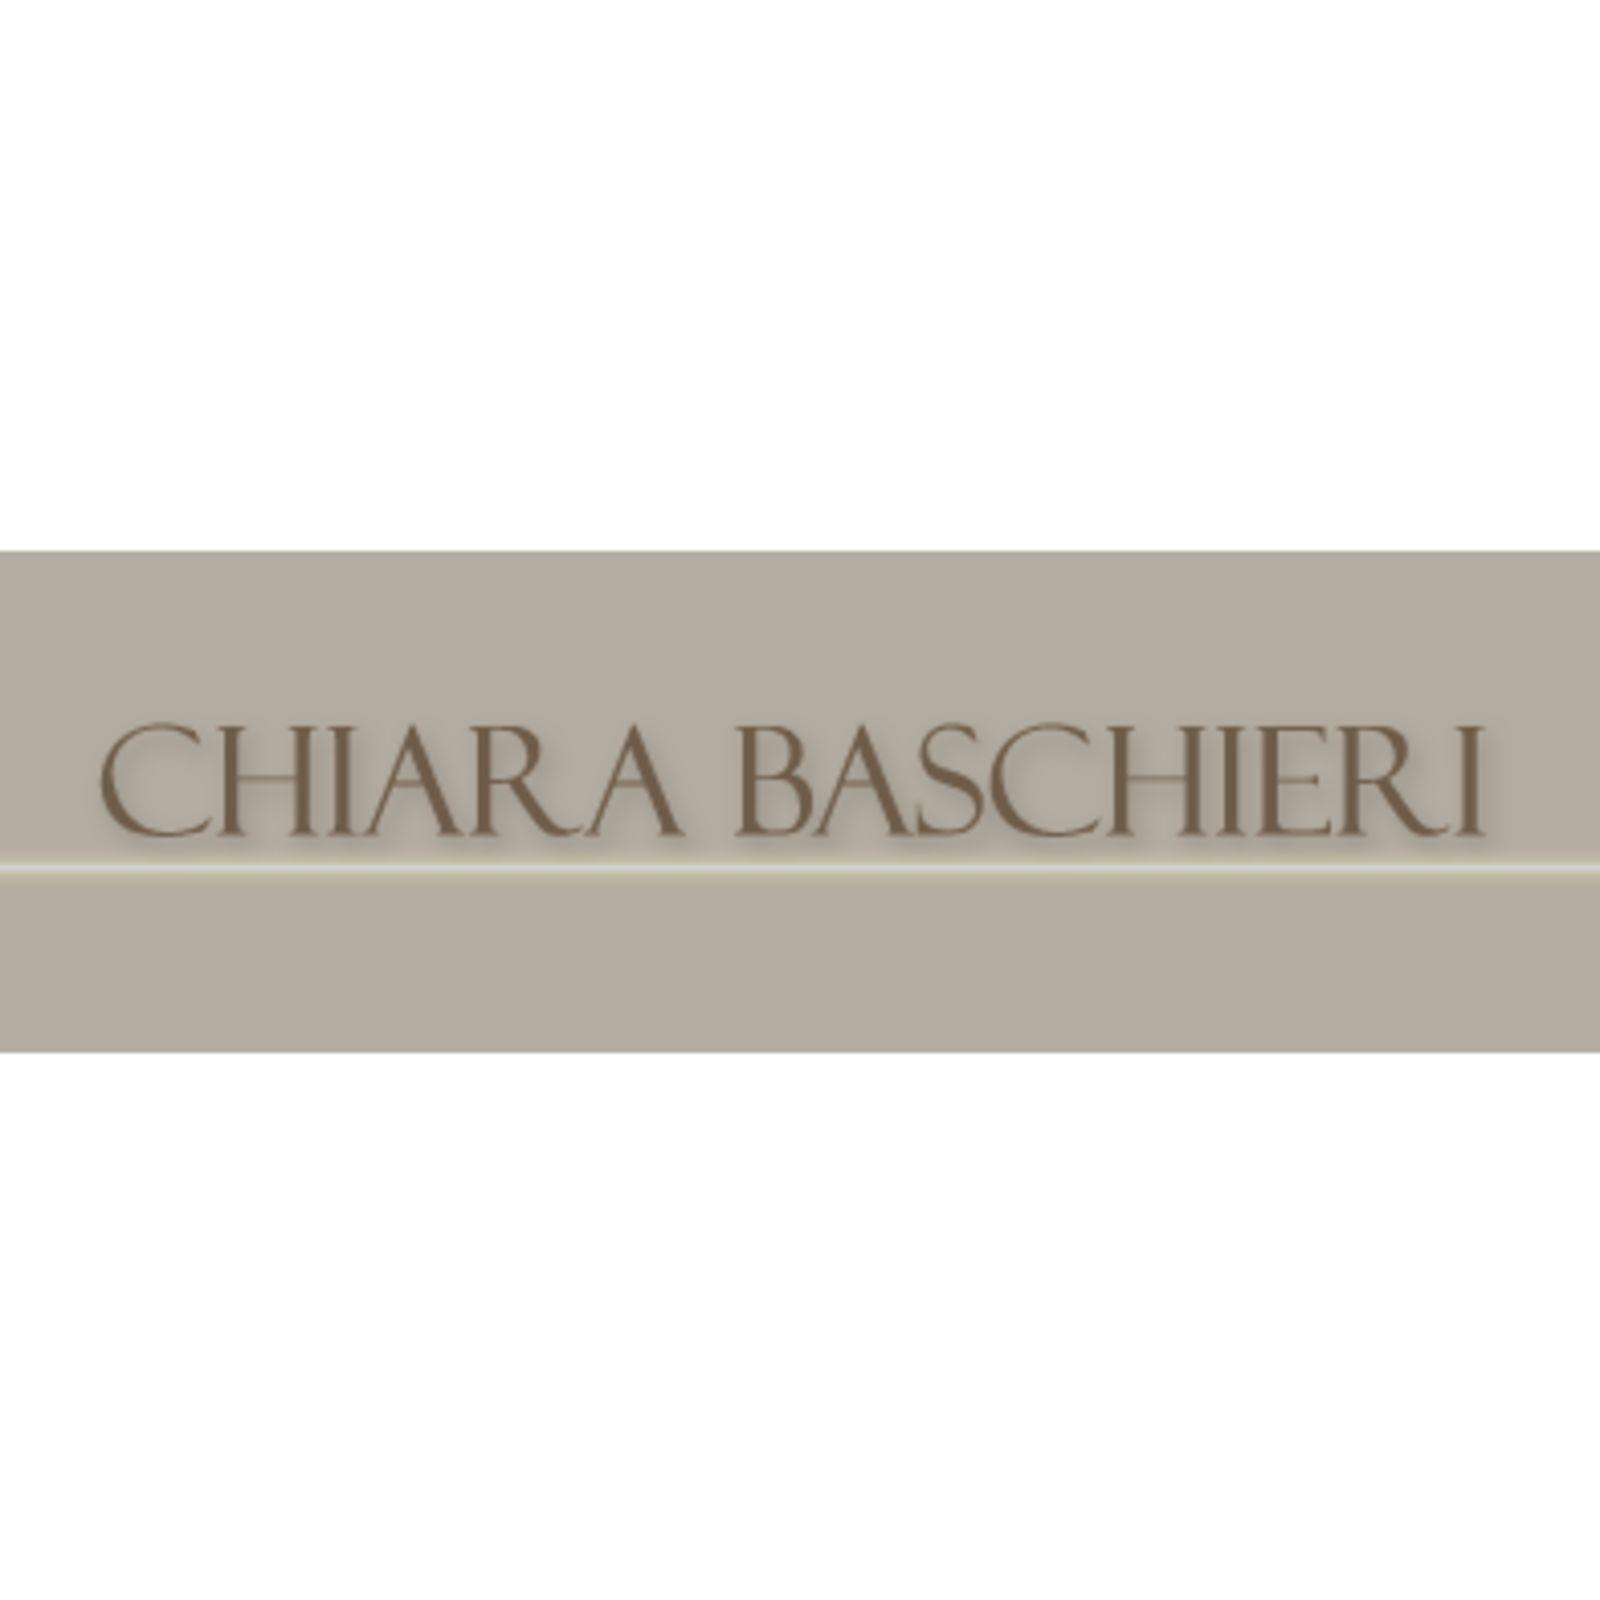 CHIARA BASCHIERI